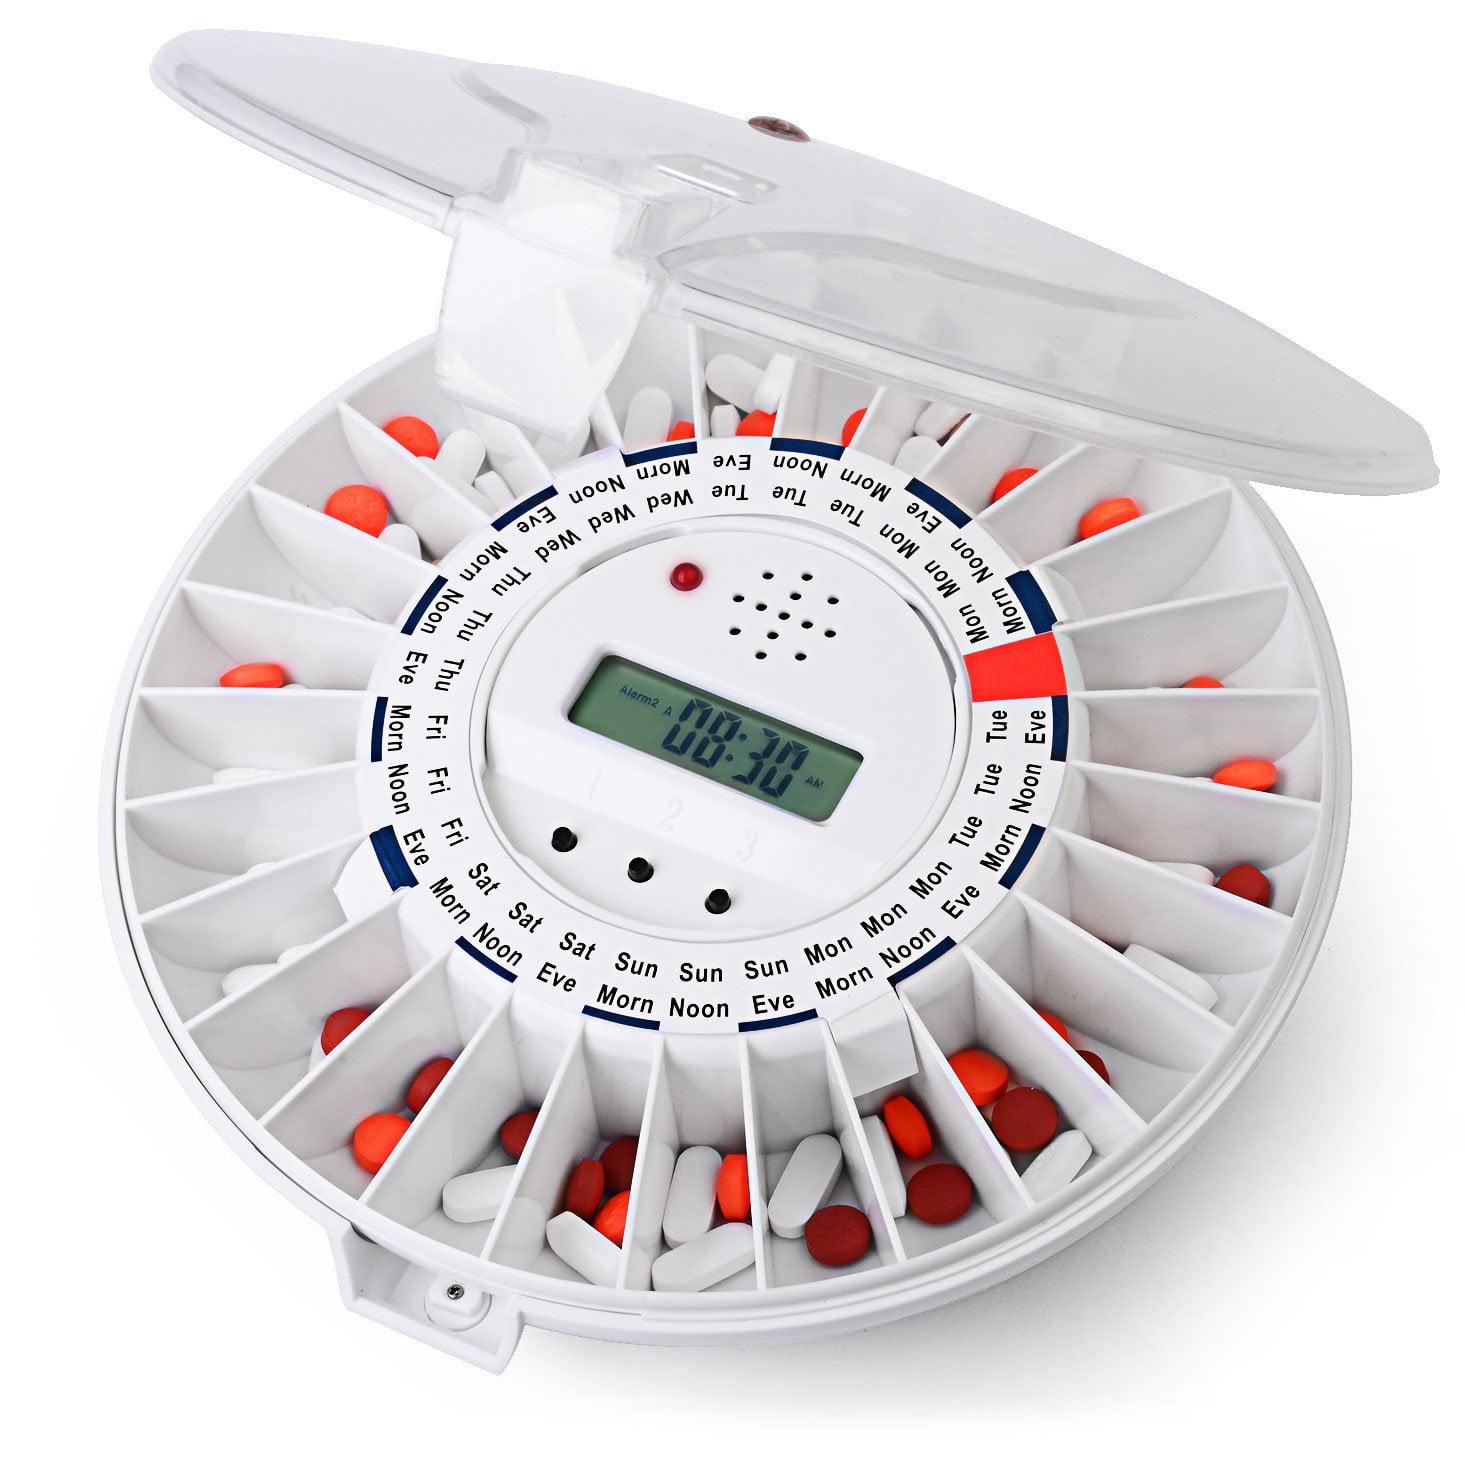 Kinsman Med-e-lert Automatic Pill Dispenser, Clear